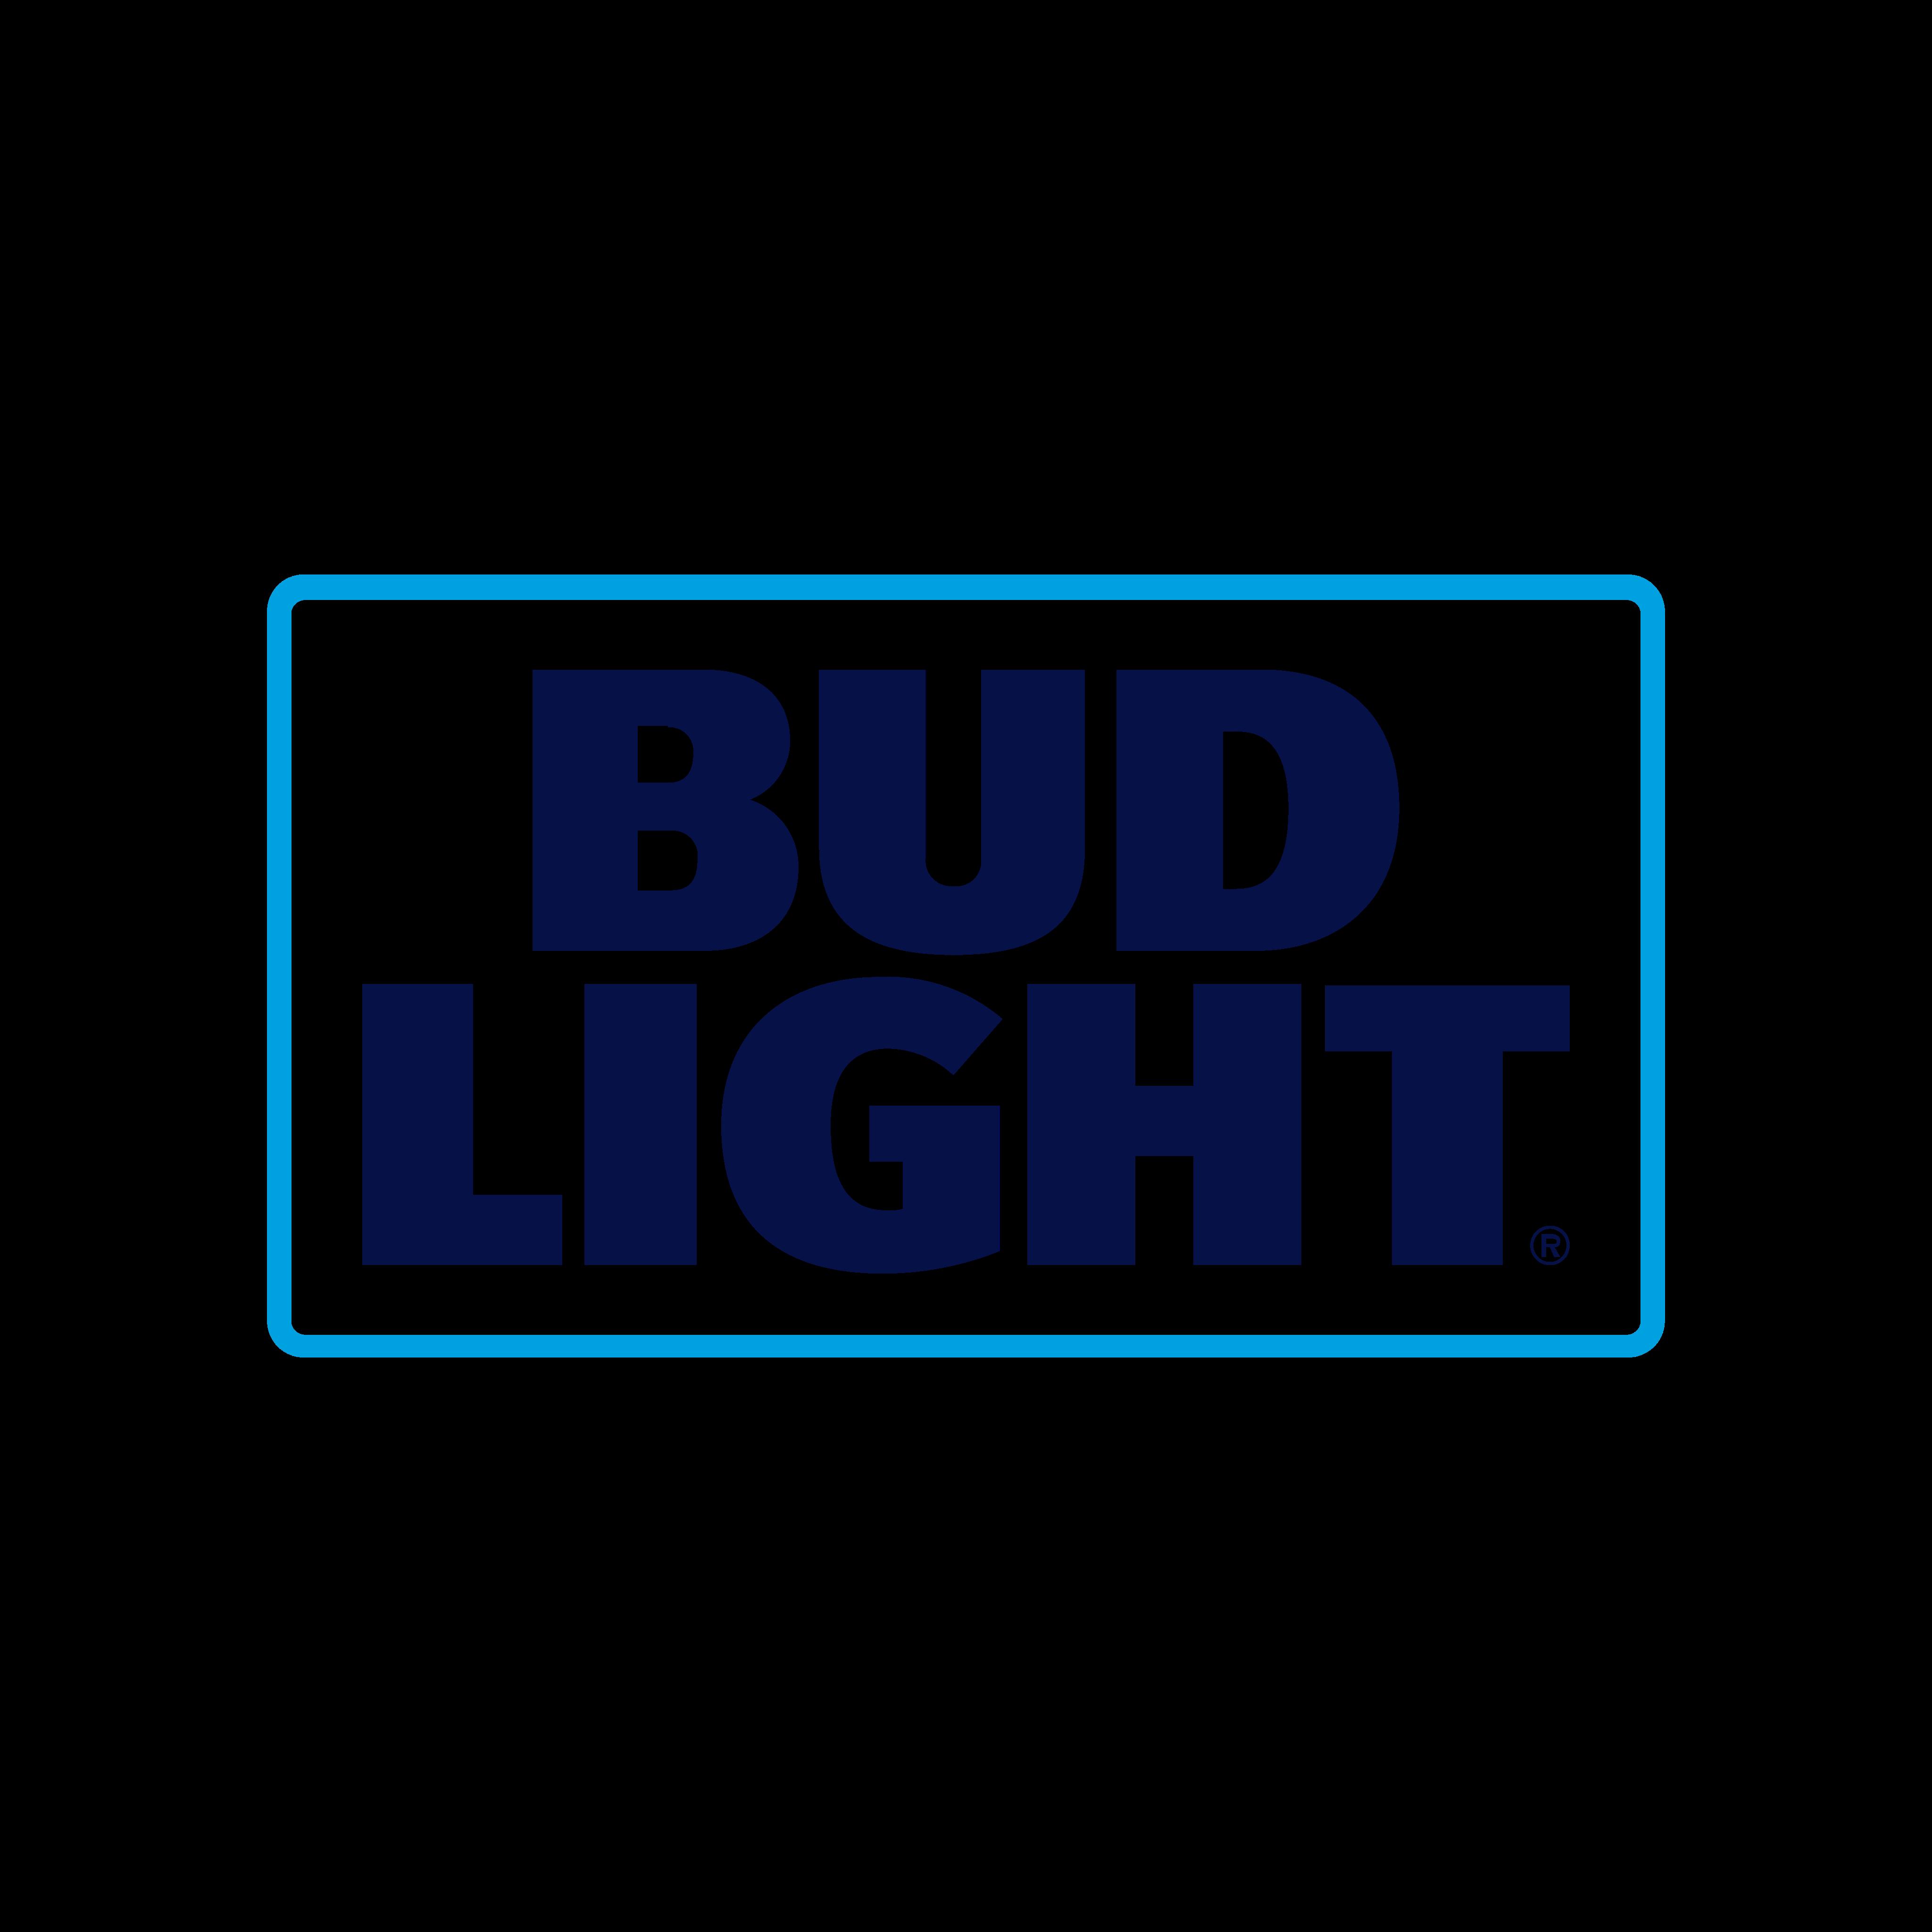 bud light logo 0 - Bud Light Logo